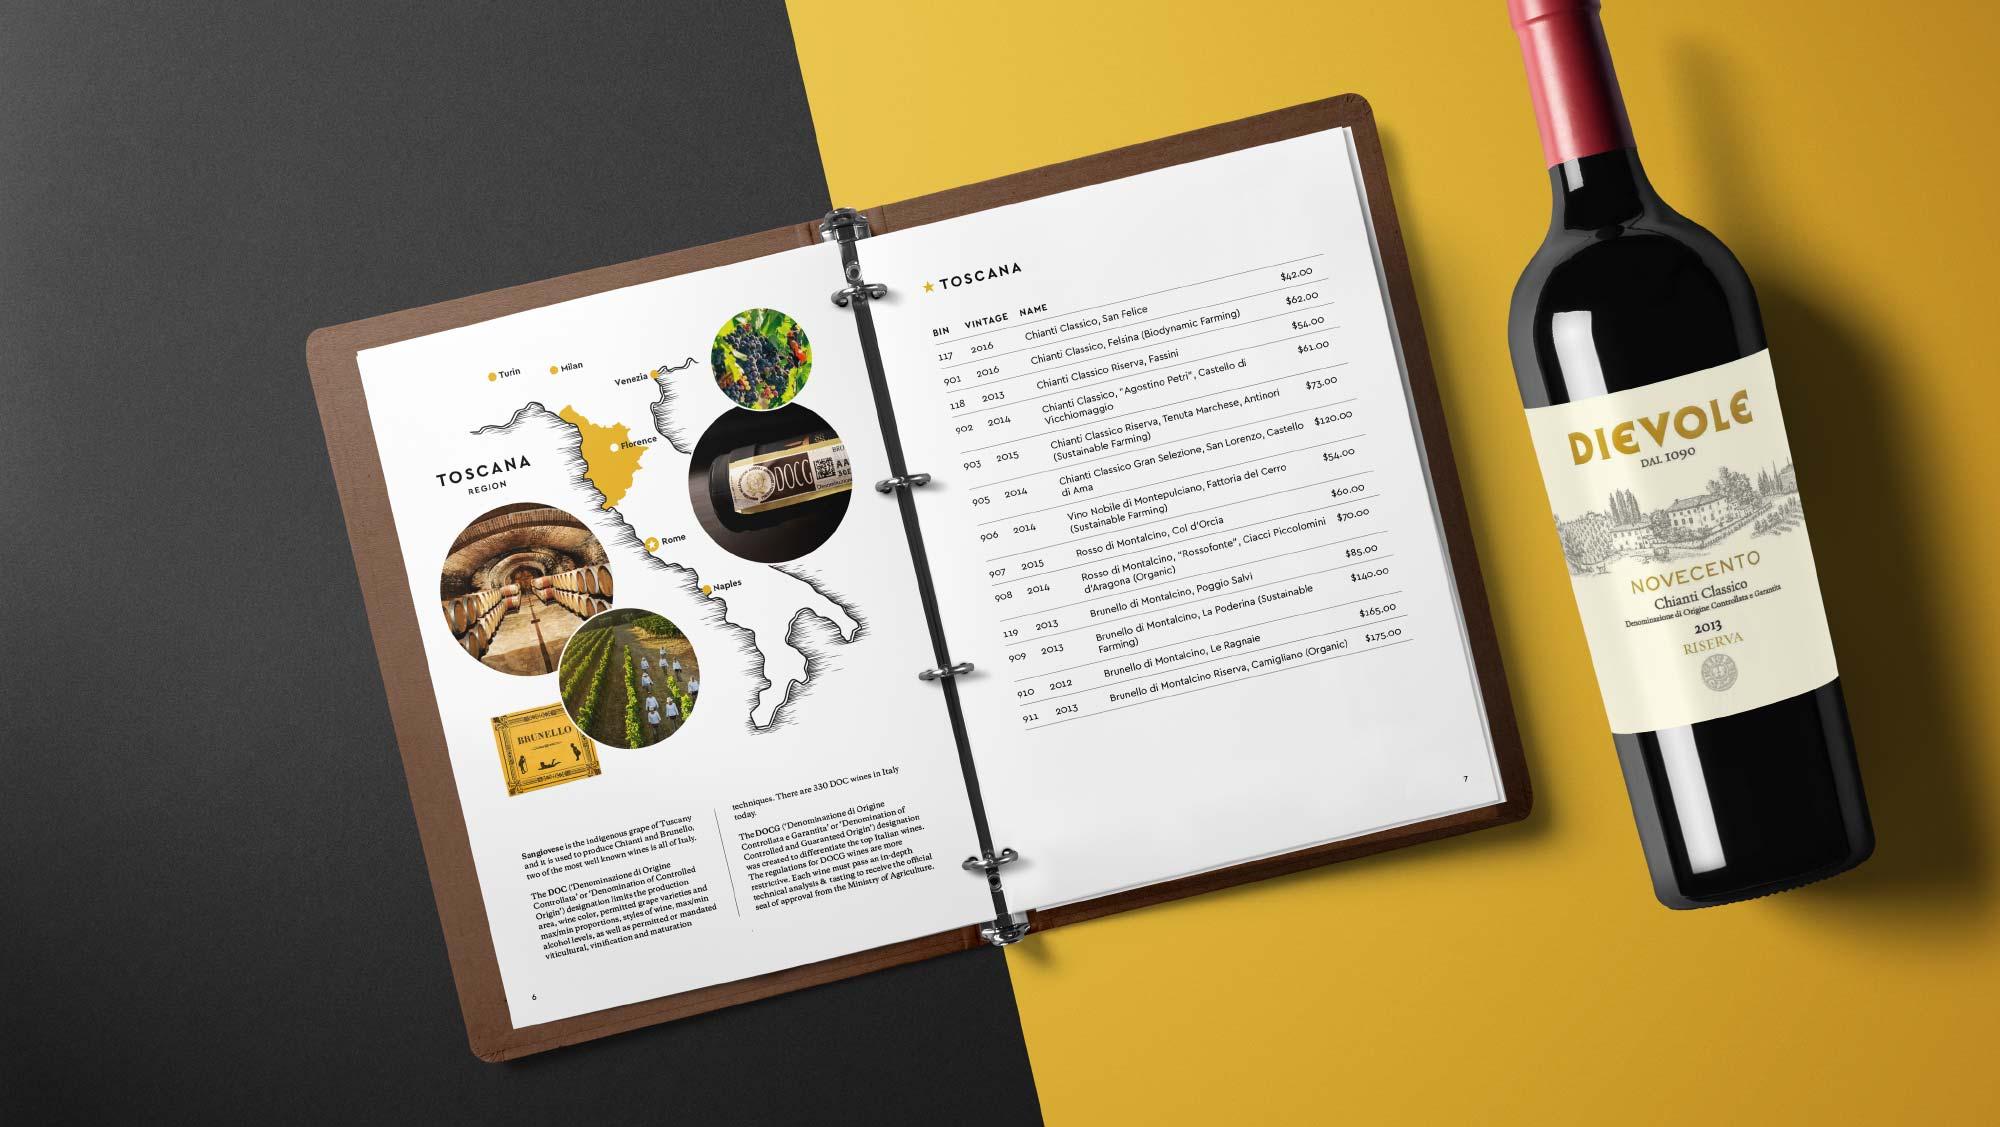 wine book menu design for restaurants in Rhode Island